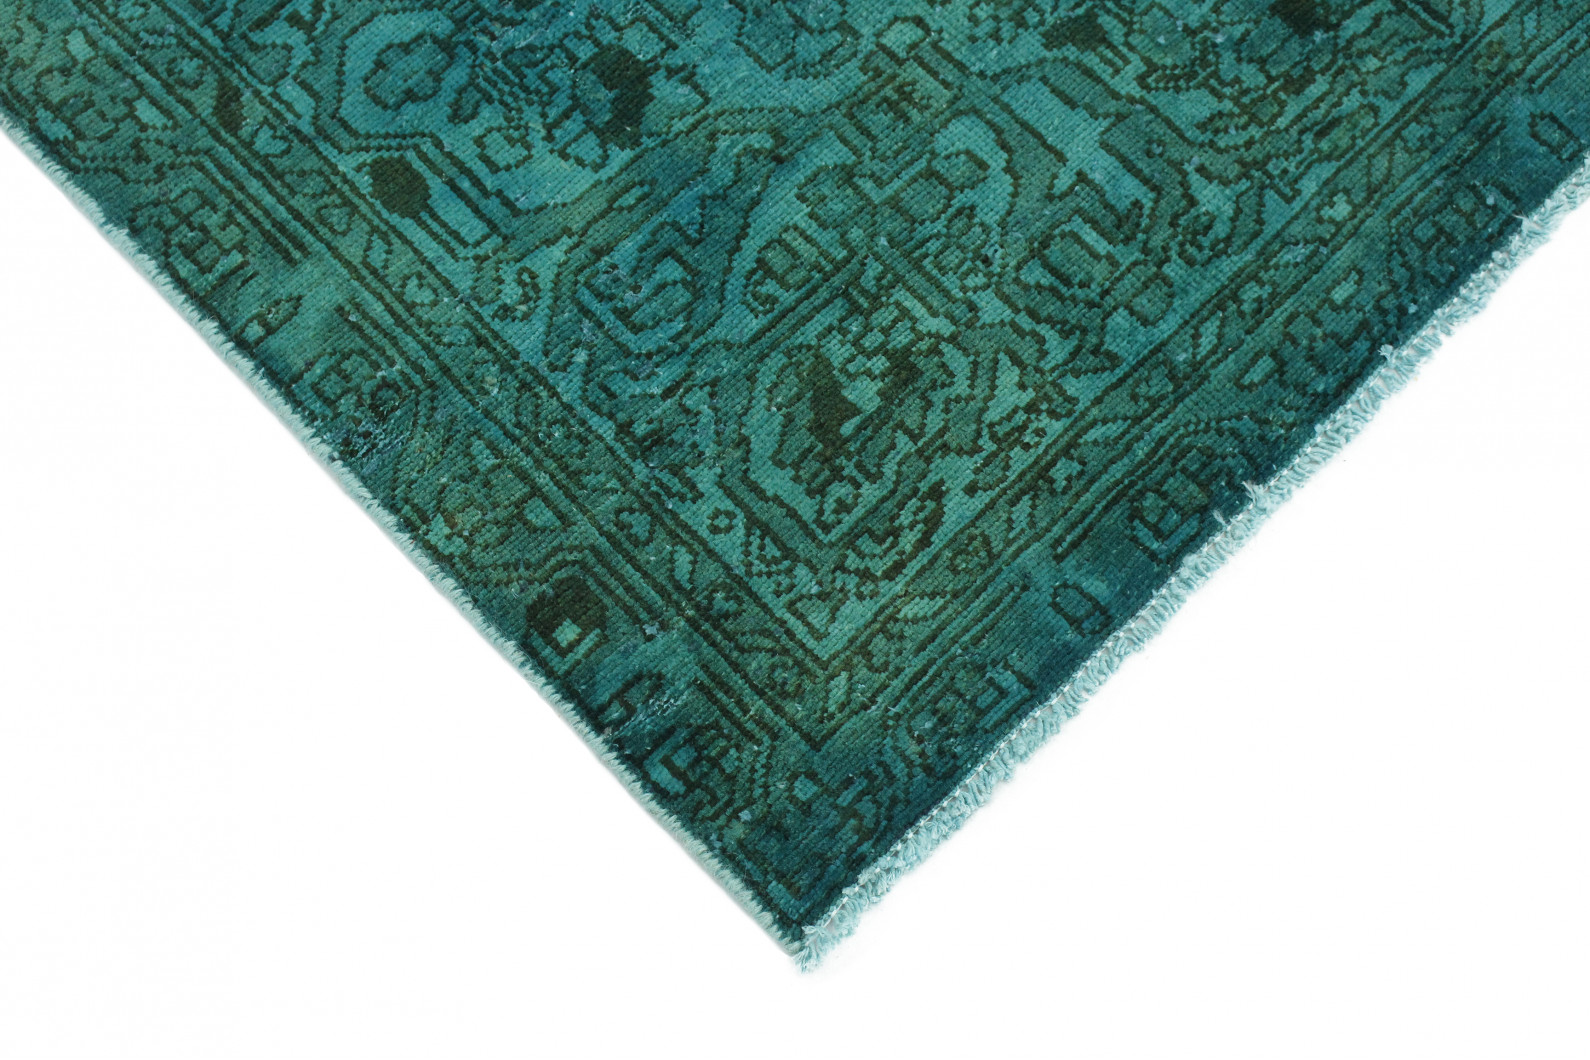 vintage teppich t rkis gr n in 200x130 1001 3713 bei kaufen. Black Bedroom Furniture Sets. Home Design Ideas